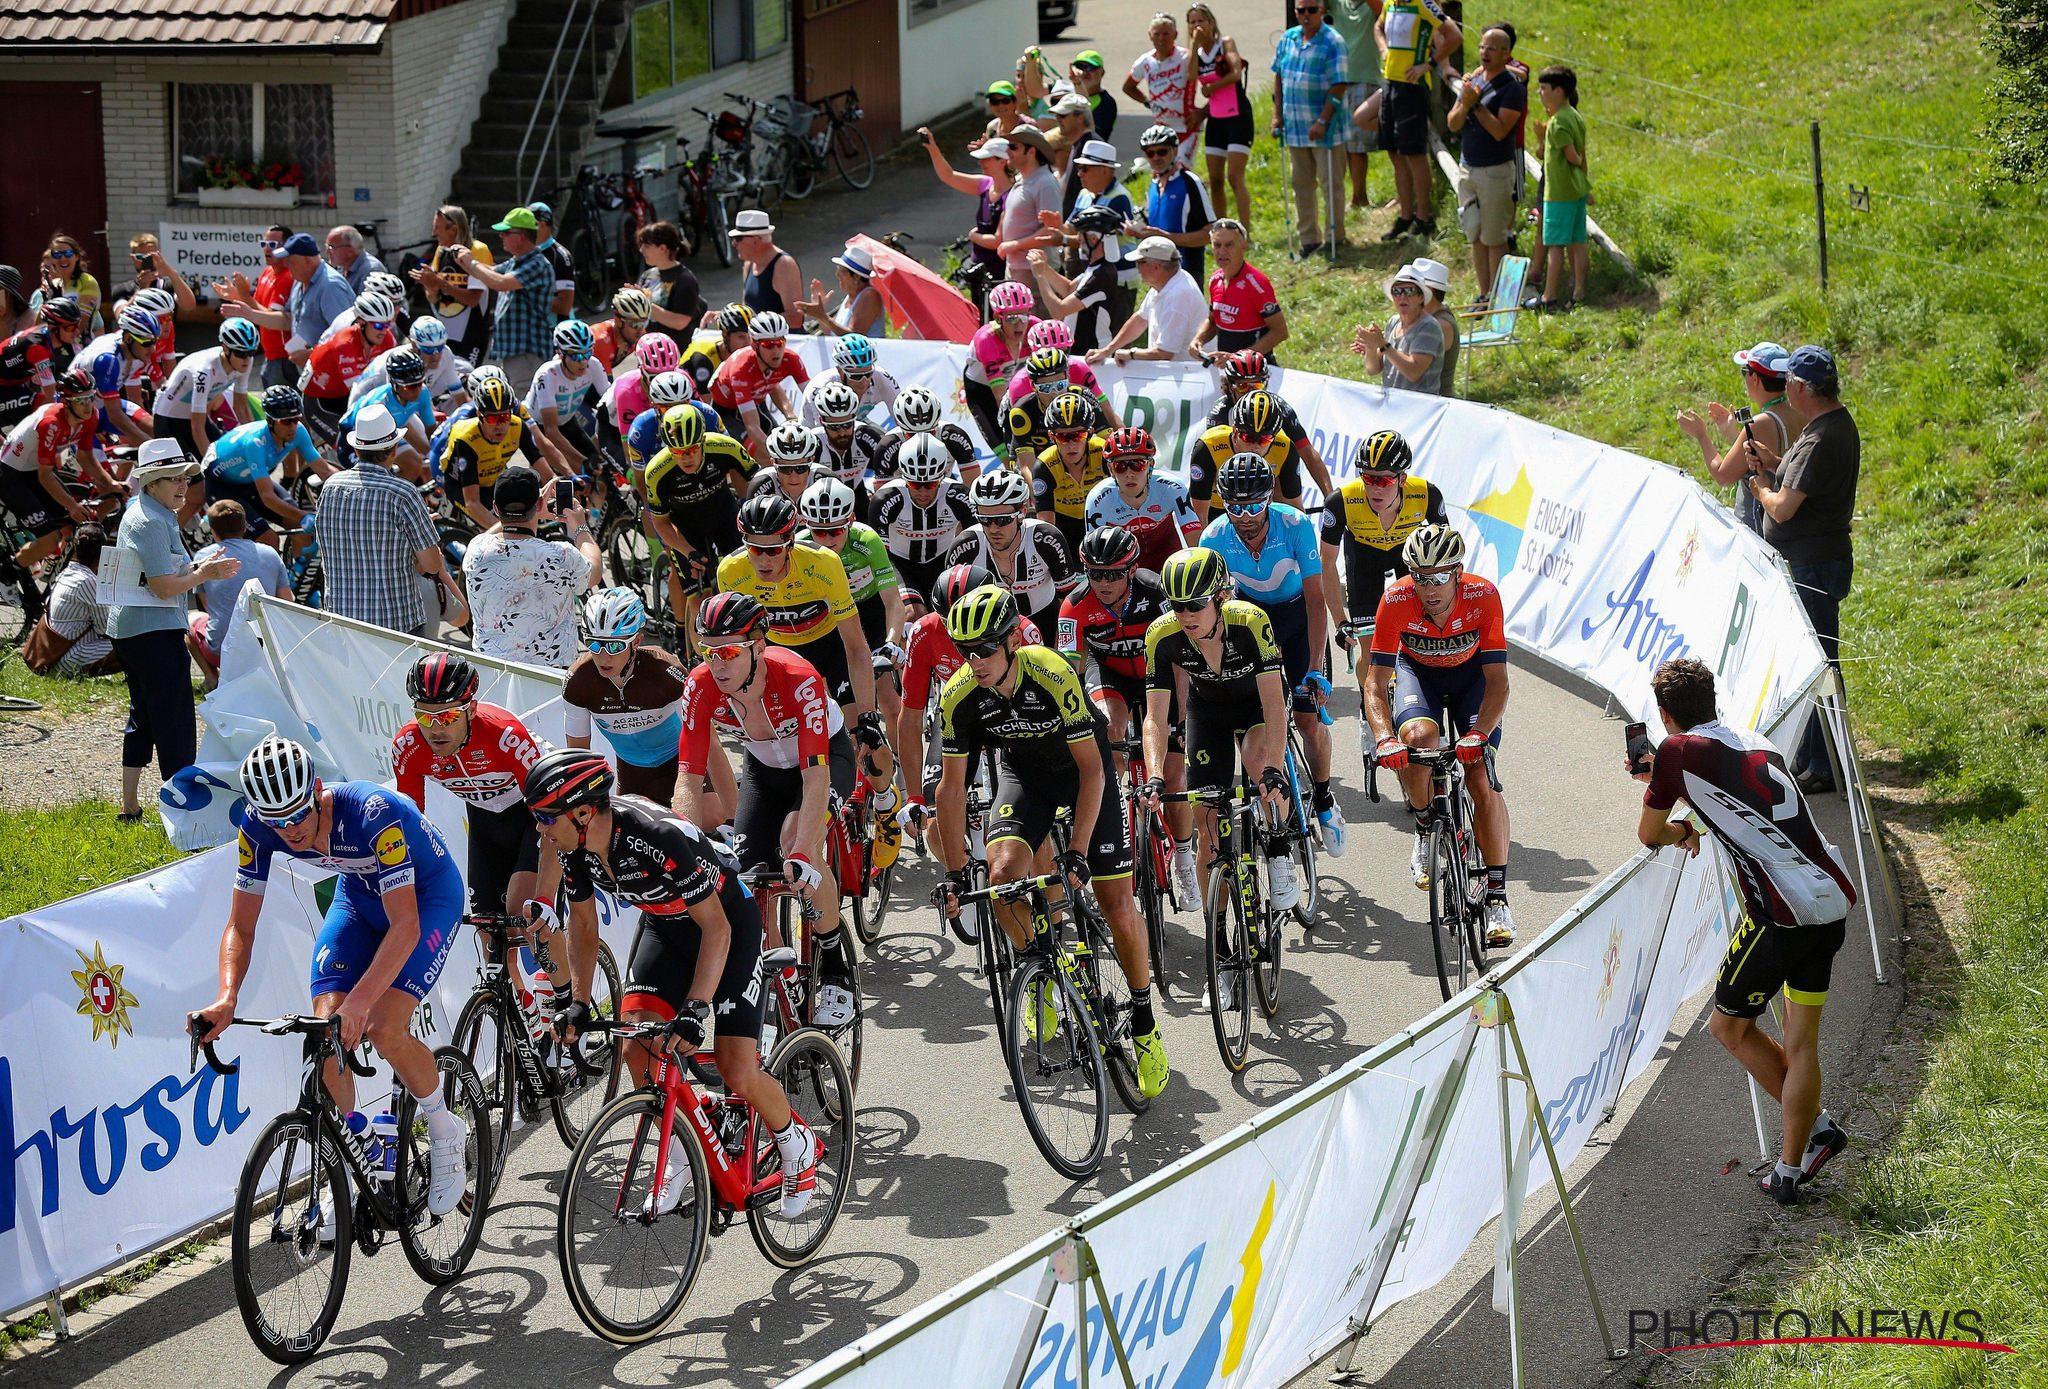 Велоспорт избавят от трамадола и низкого уровня кортизола